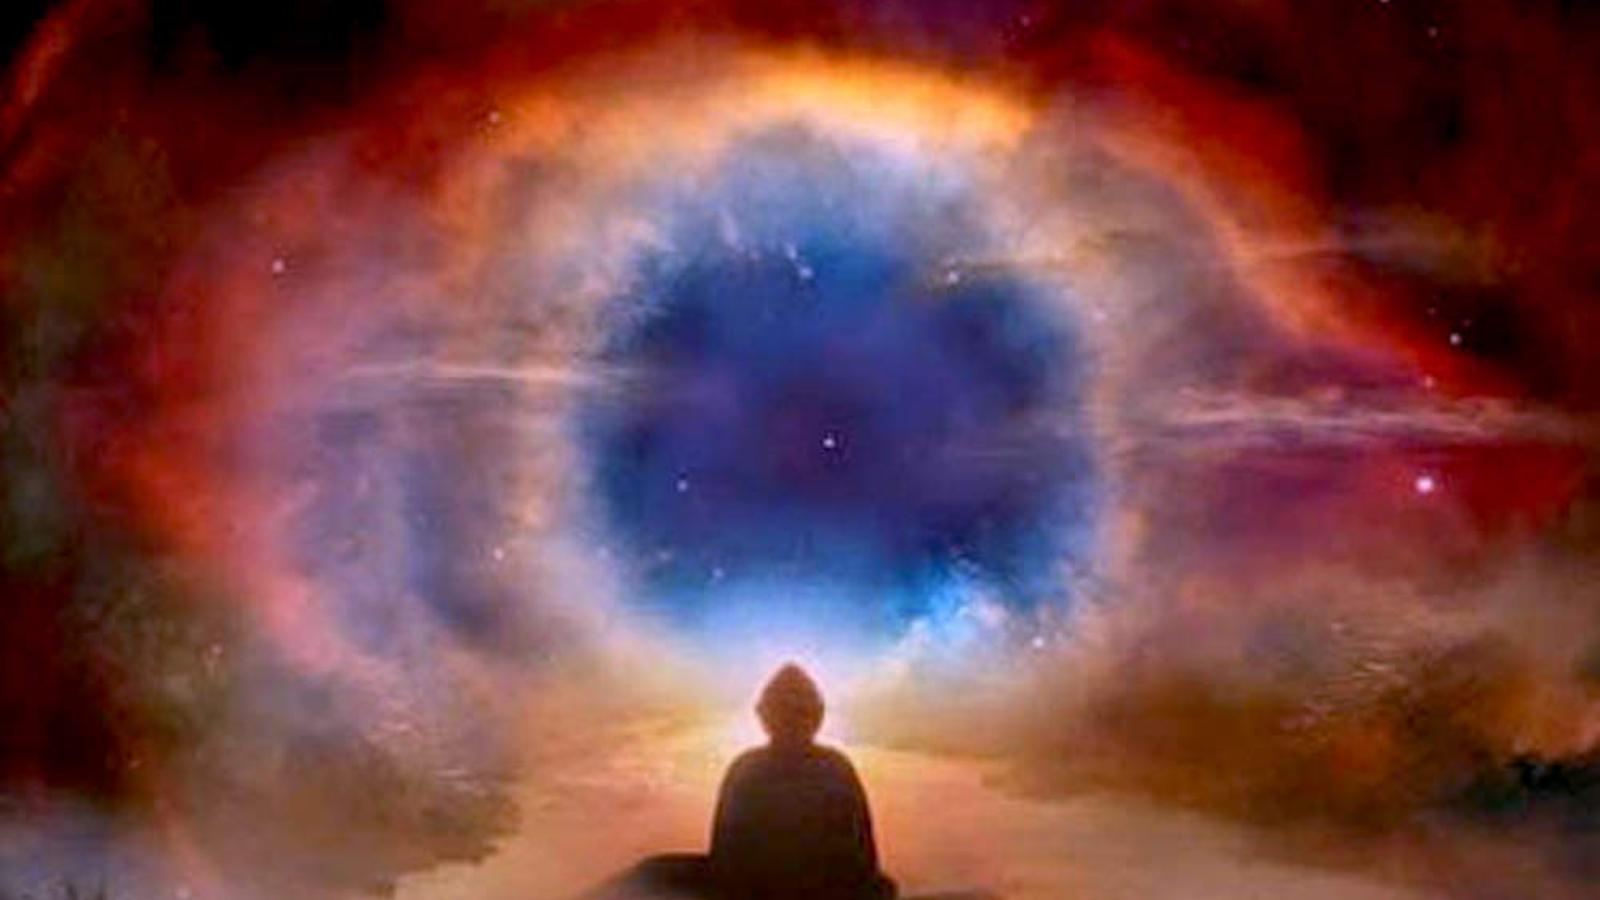 cosmic-eye-universe-peace